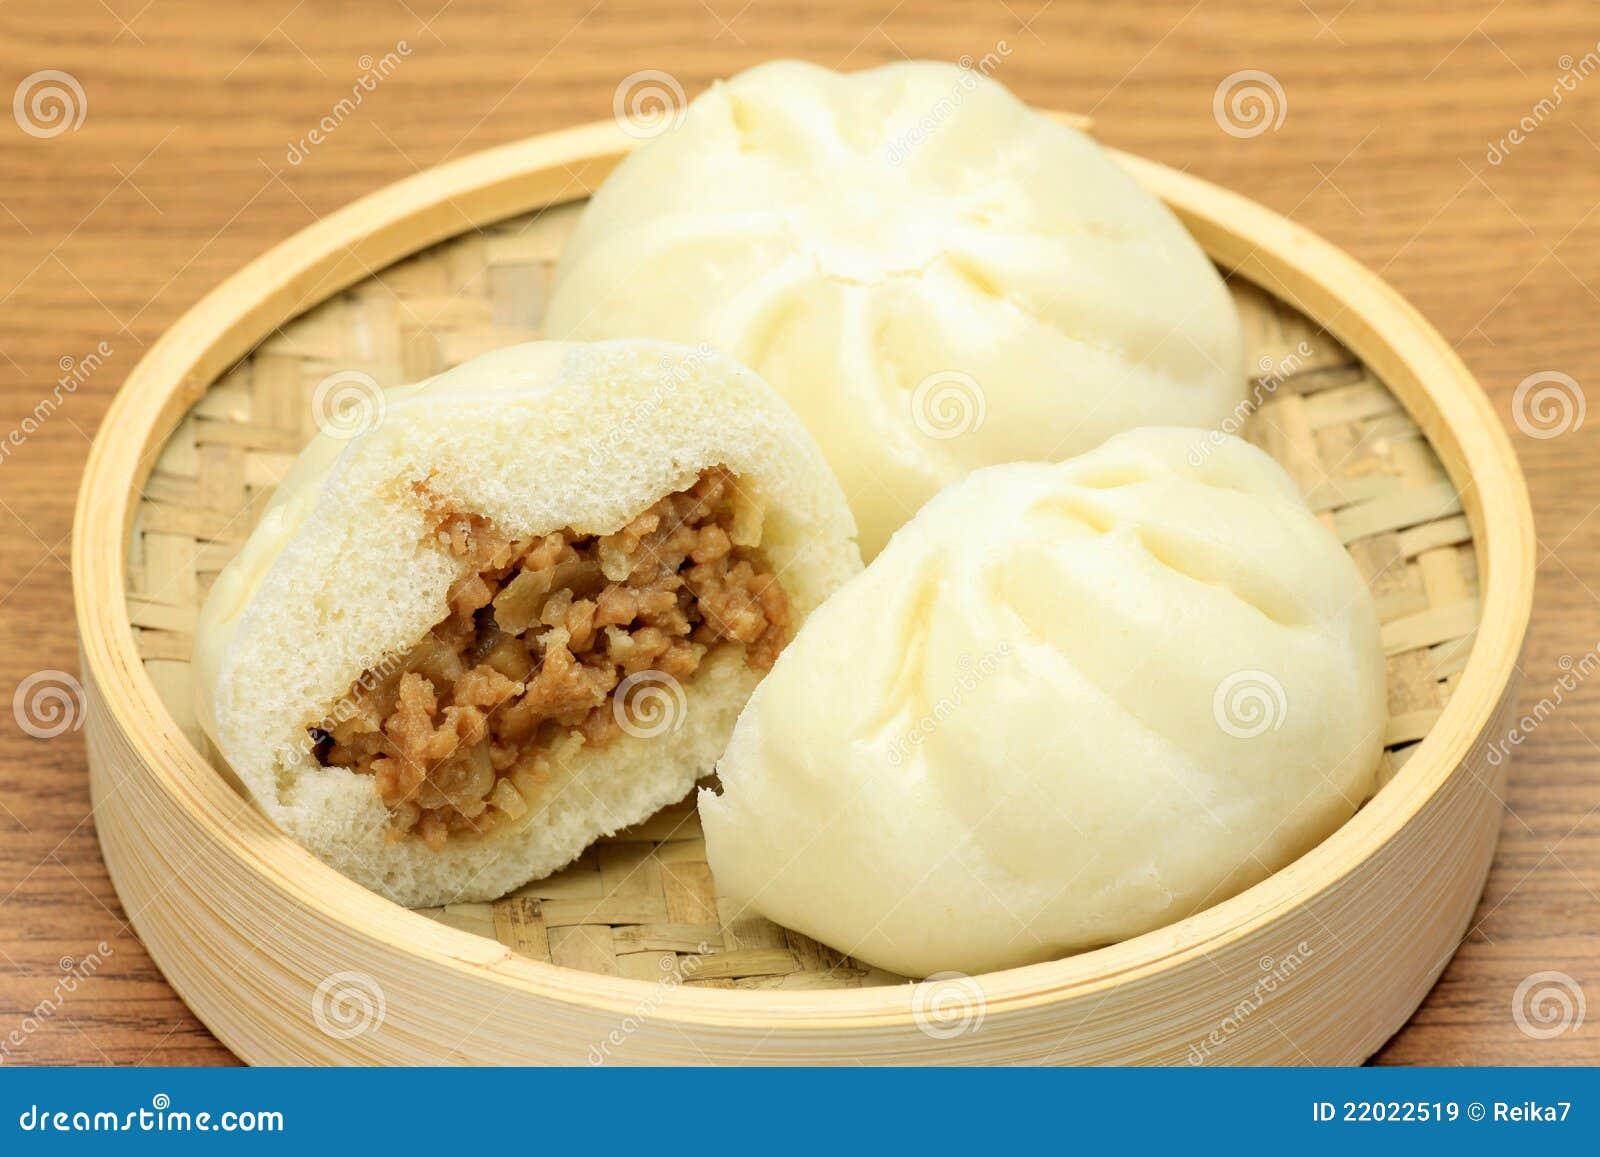 steamed meat bun royalty free stock images image 22022519. Black Bedroom Furniture Sets. Home Design Ideas